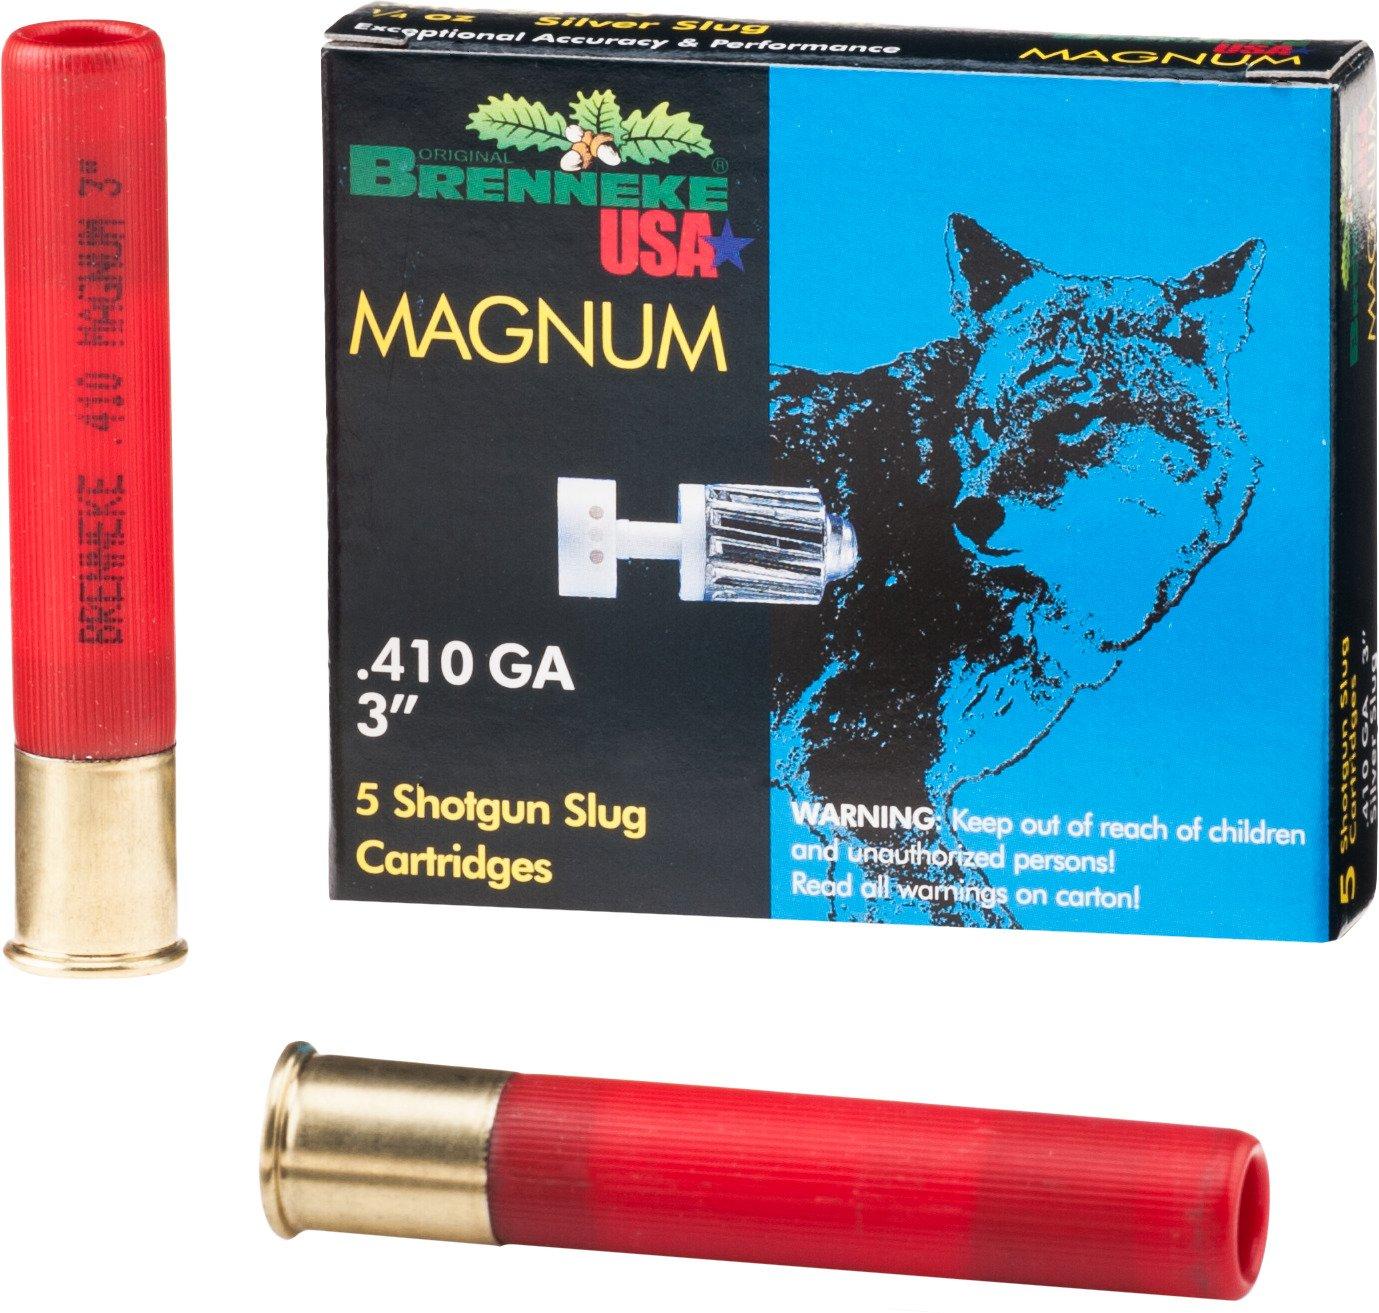 For brenneke close encounter 410 gauge shotgun slugs from academy